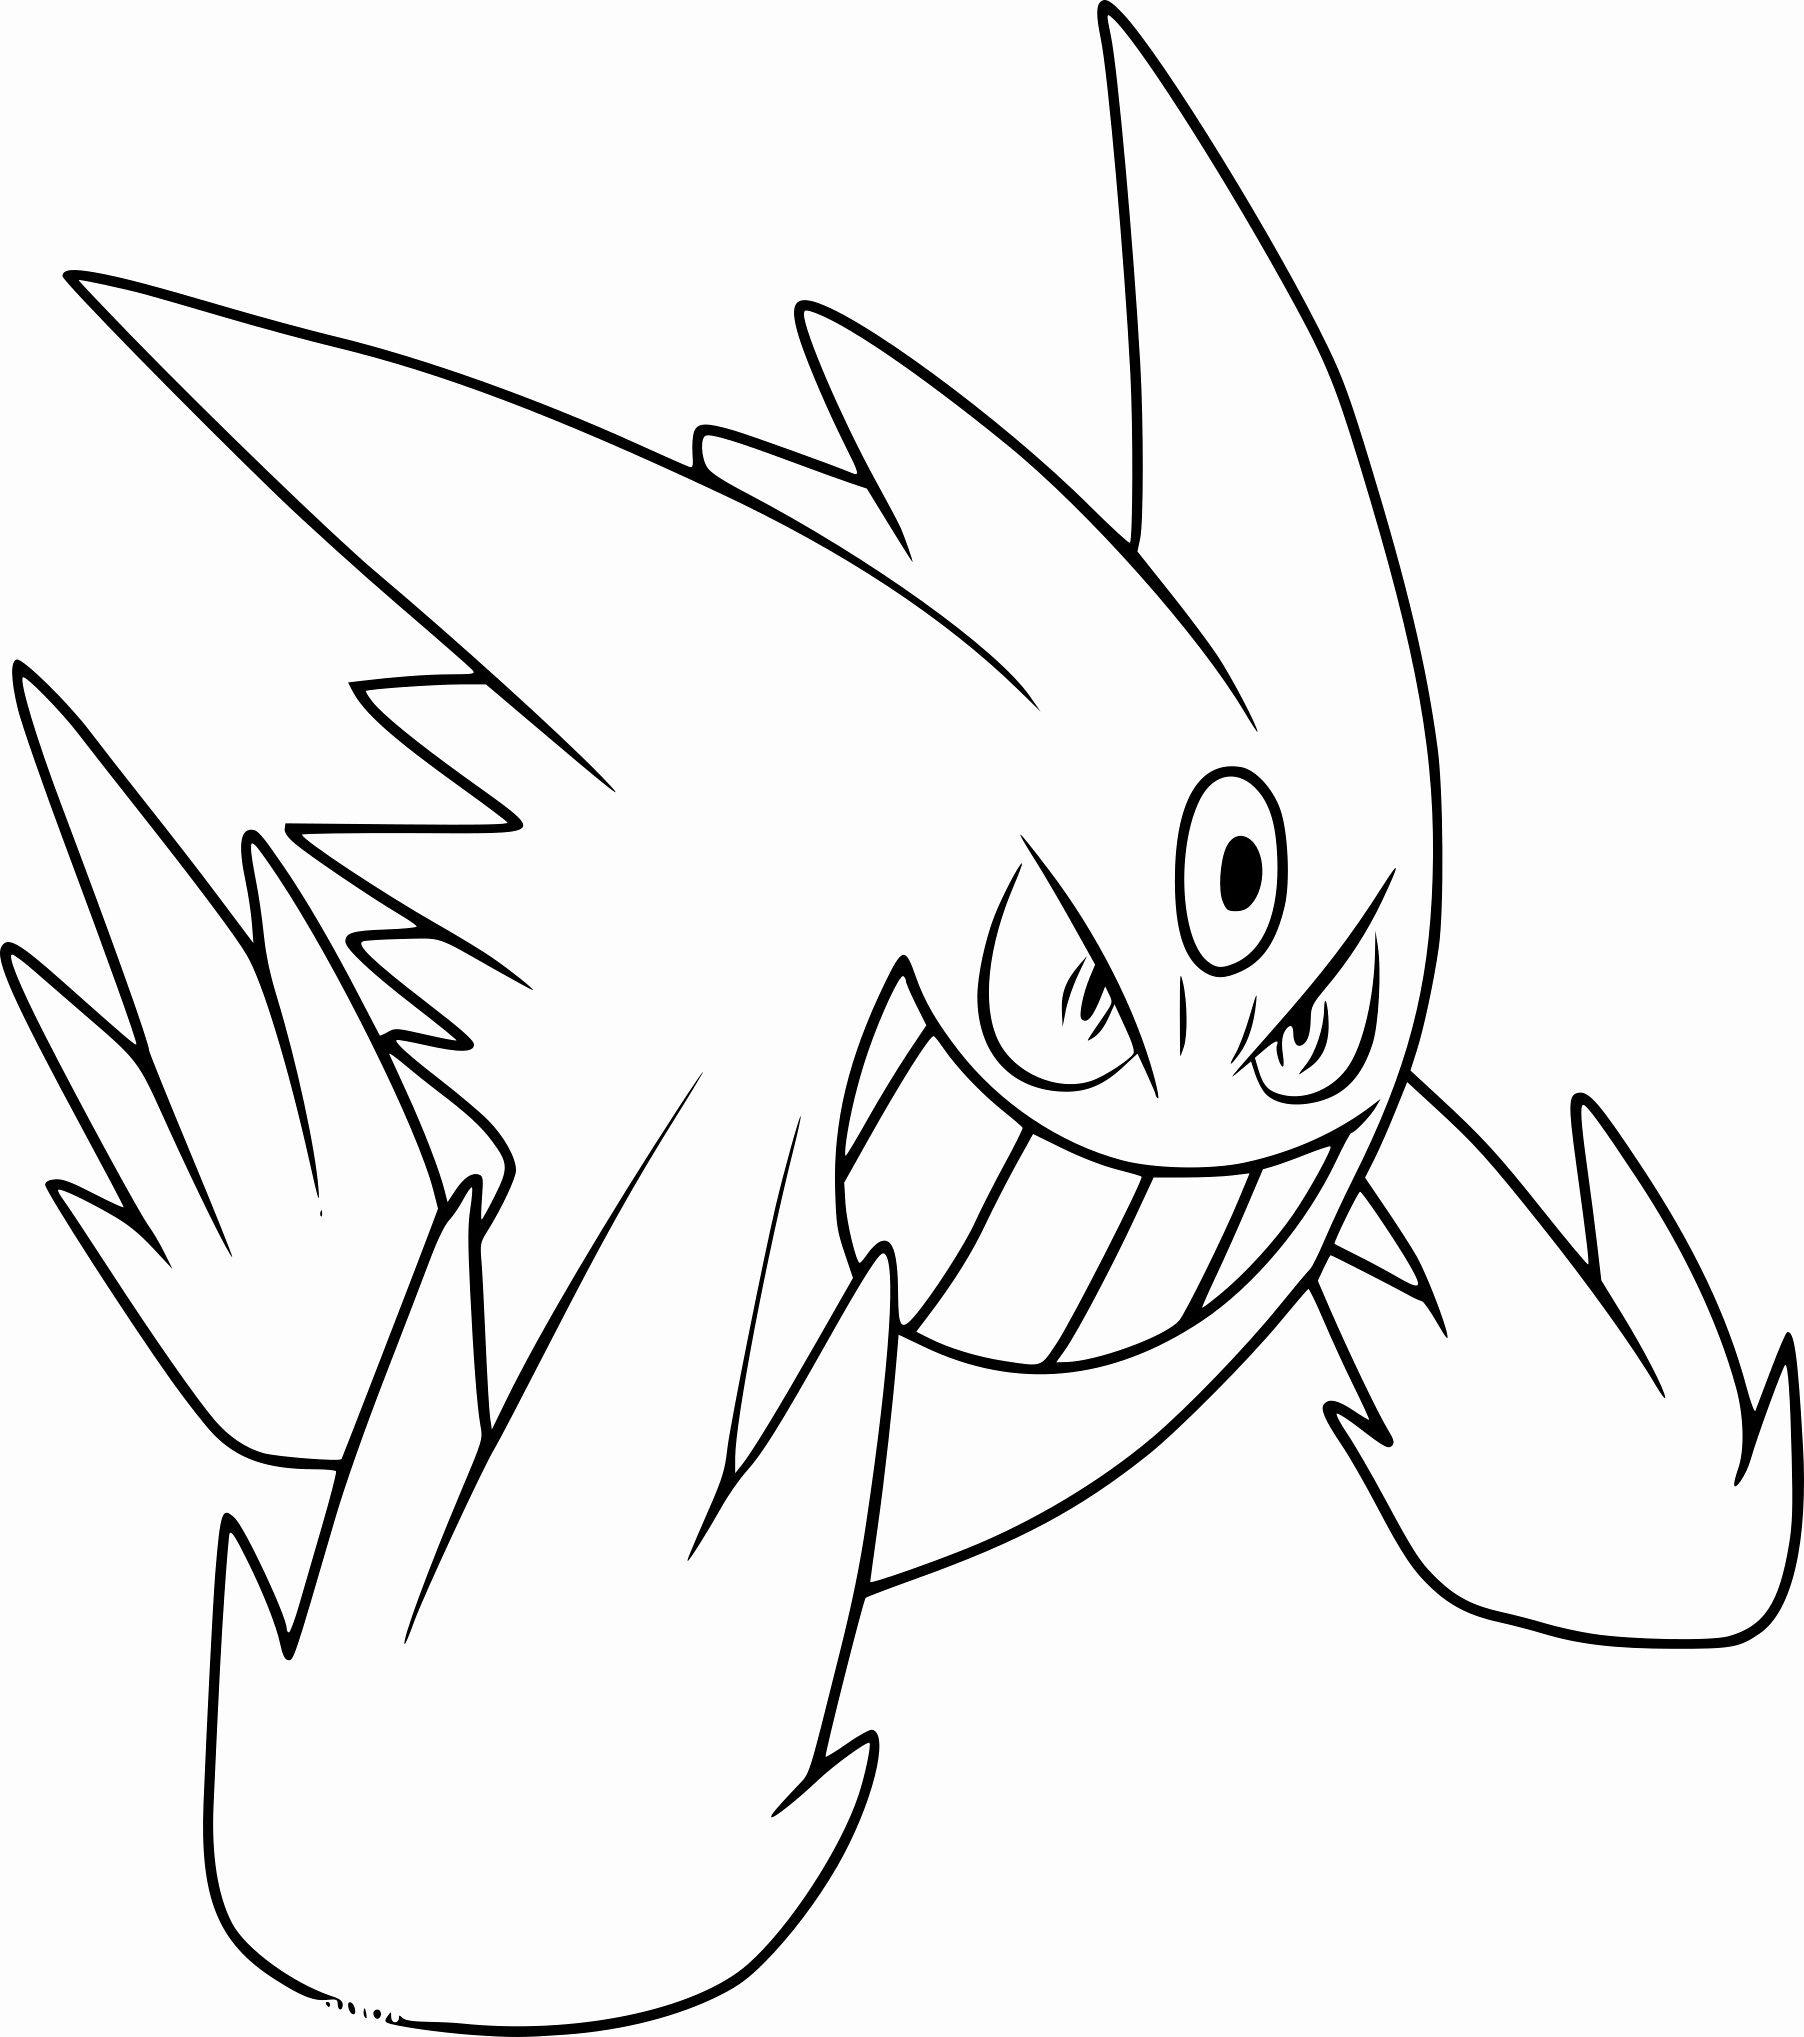 Coloriage Matoufeu Pokemon Genial Coloriage Magique Pokemon Soleil